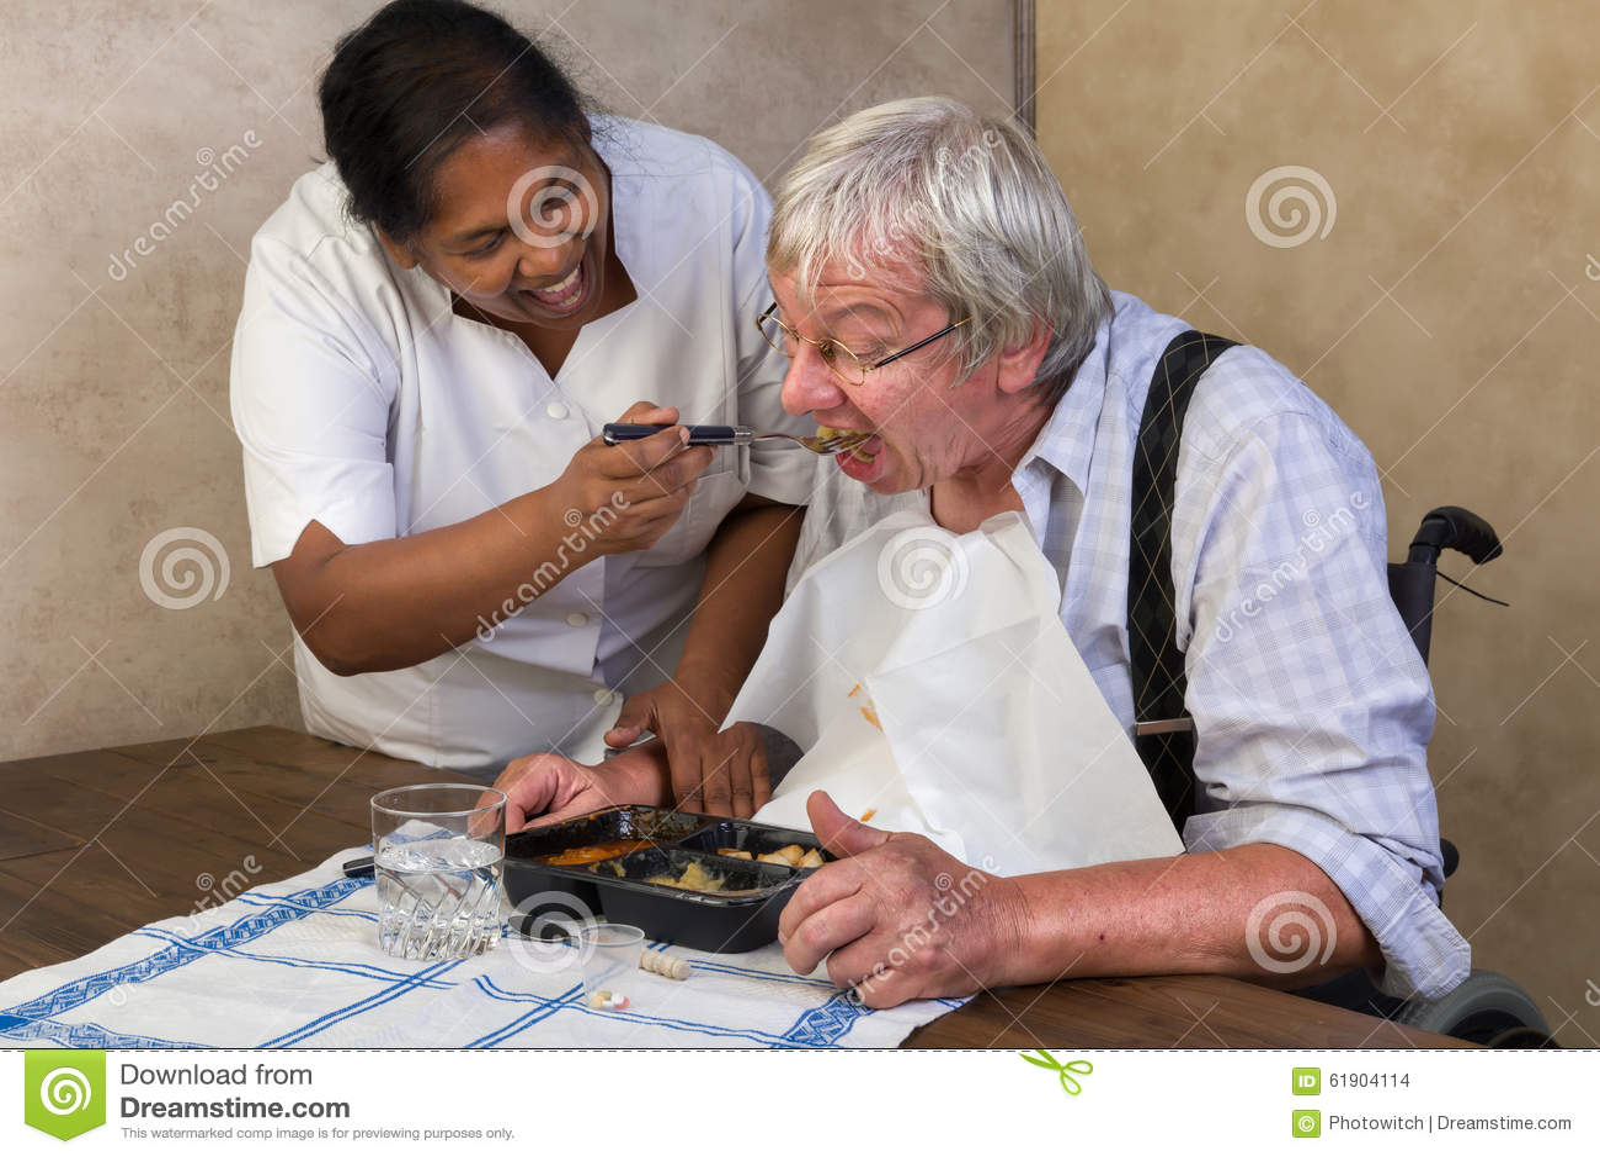 Dinner Time In Nursing Home Stock Photo Image 61904114